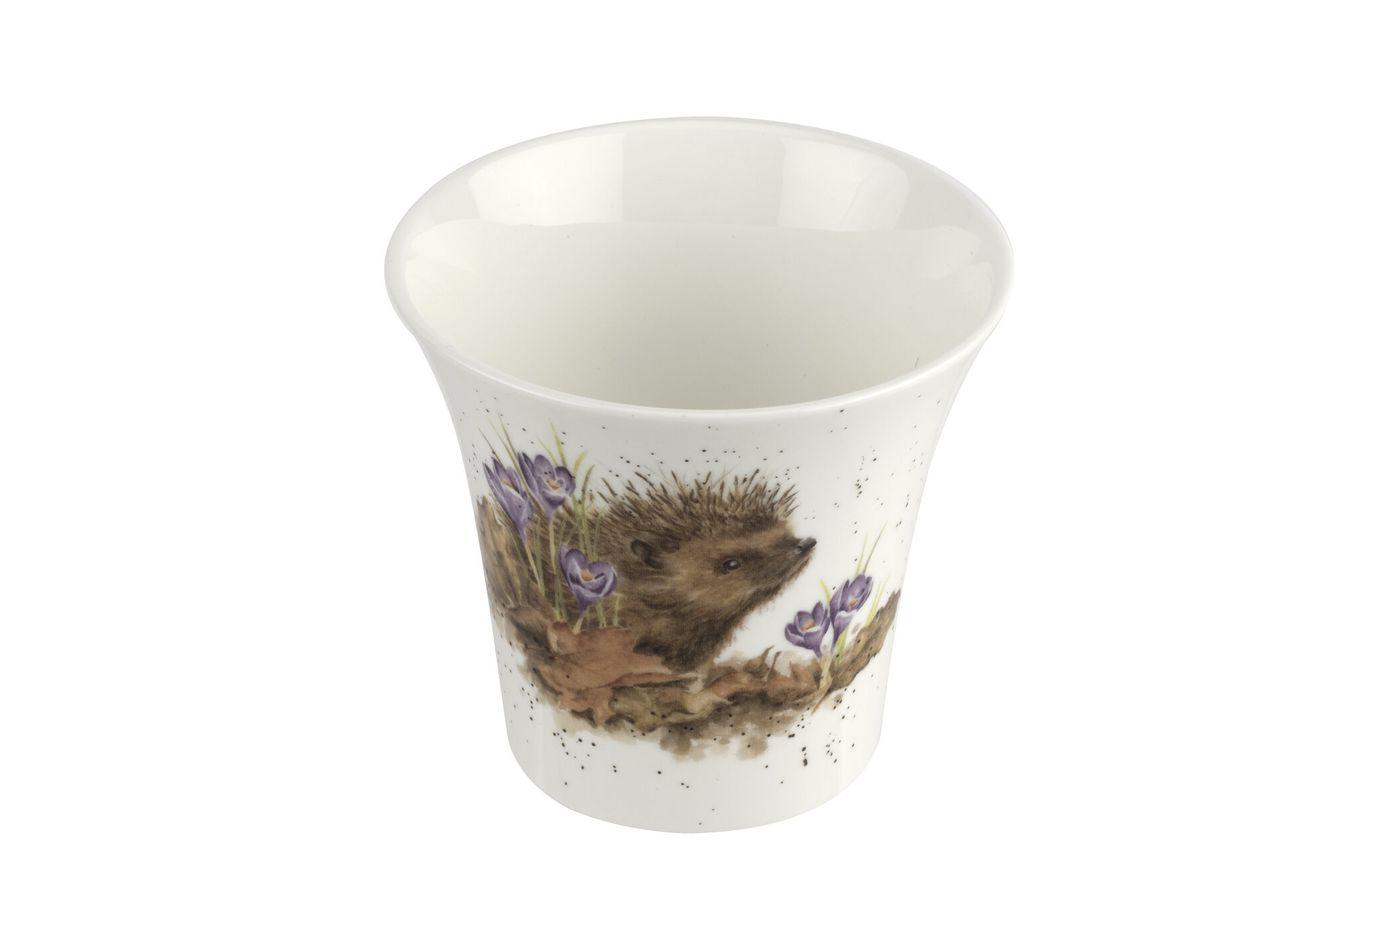 Royal Worcester Wrendale Designs Flower Pot 10cm thumb 3